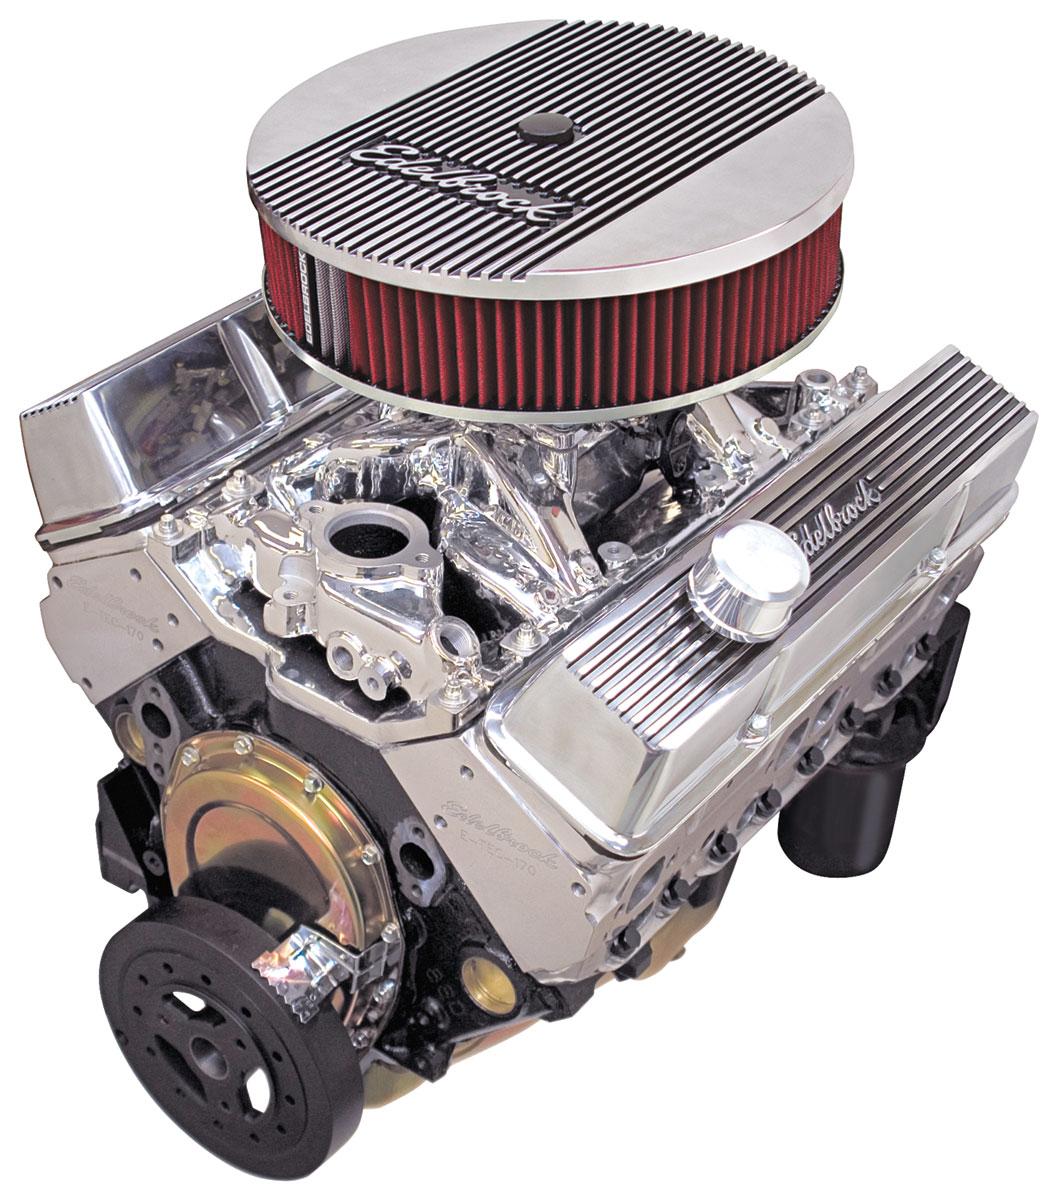 Crate Engine, RPM E-TEC, Edelbrock, Chevy 350, Long Water Pump, EnduraShine